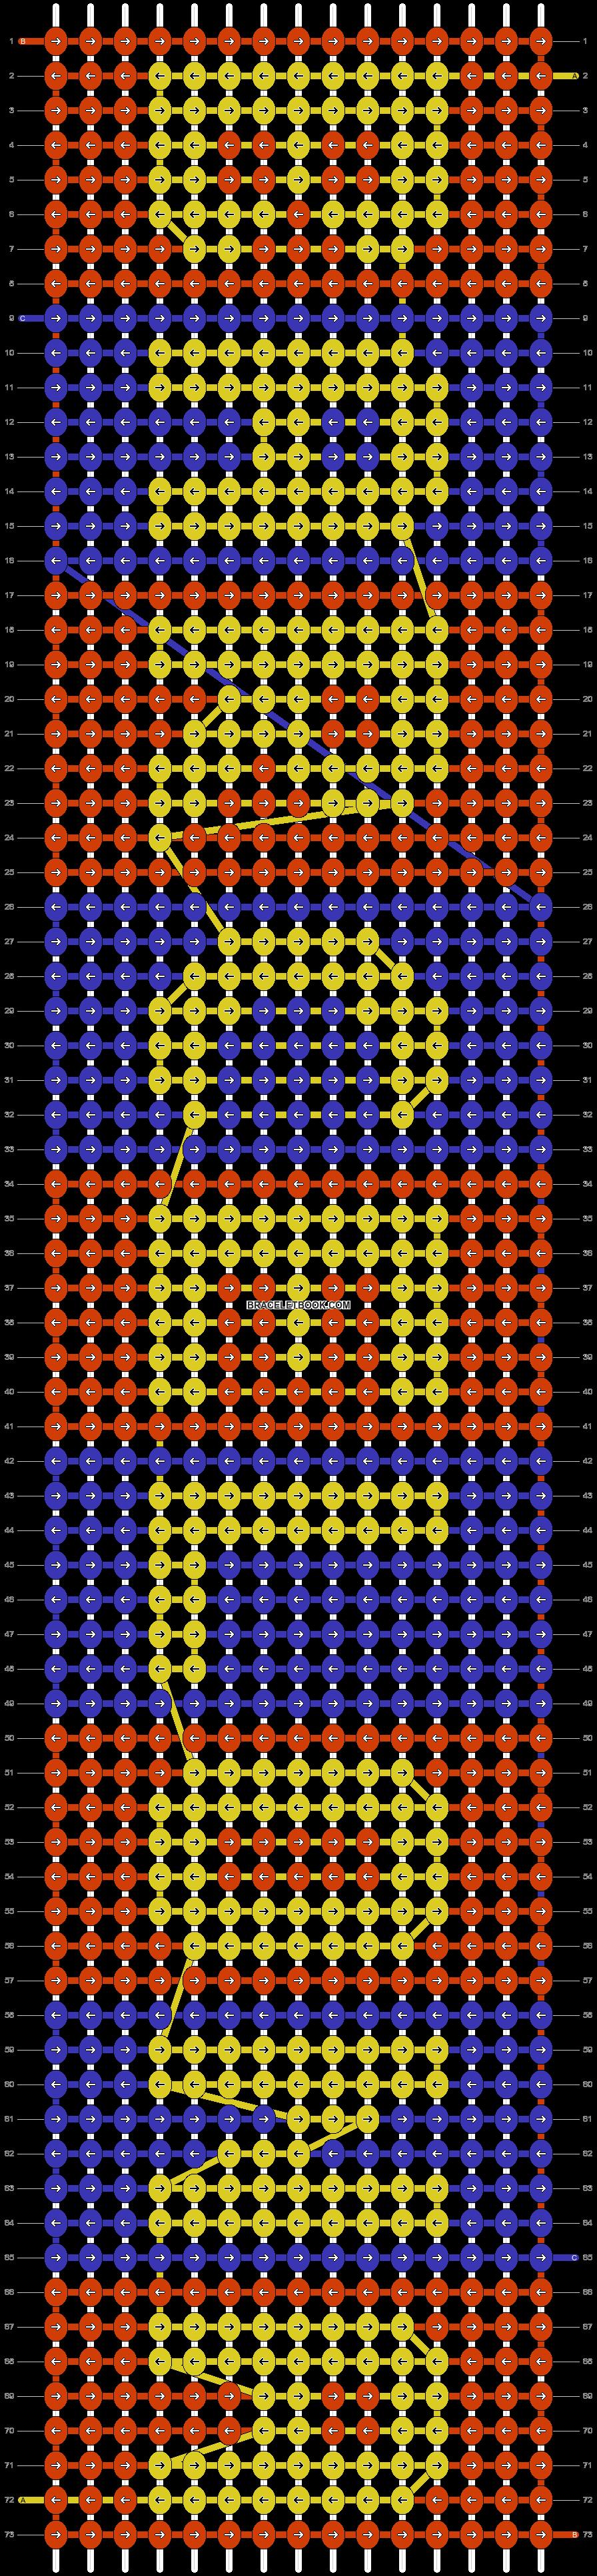 Alpha pattern #42618 pattern